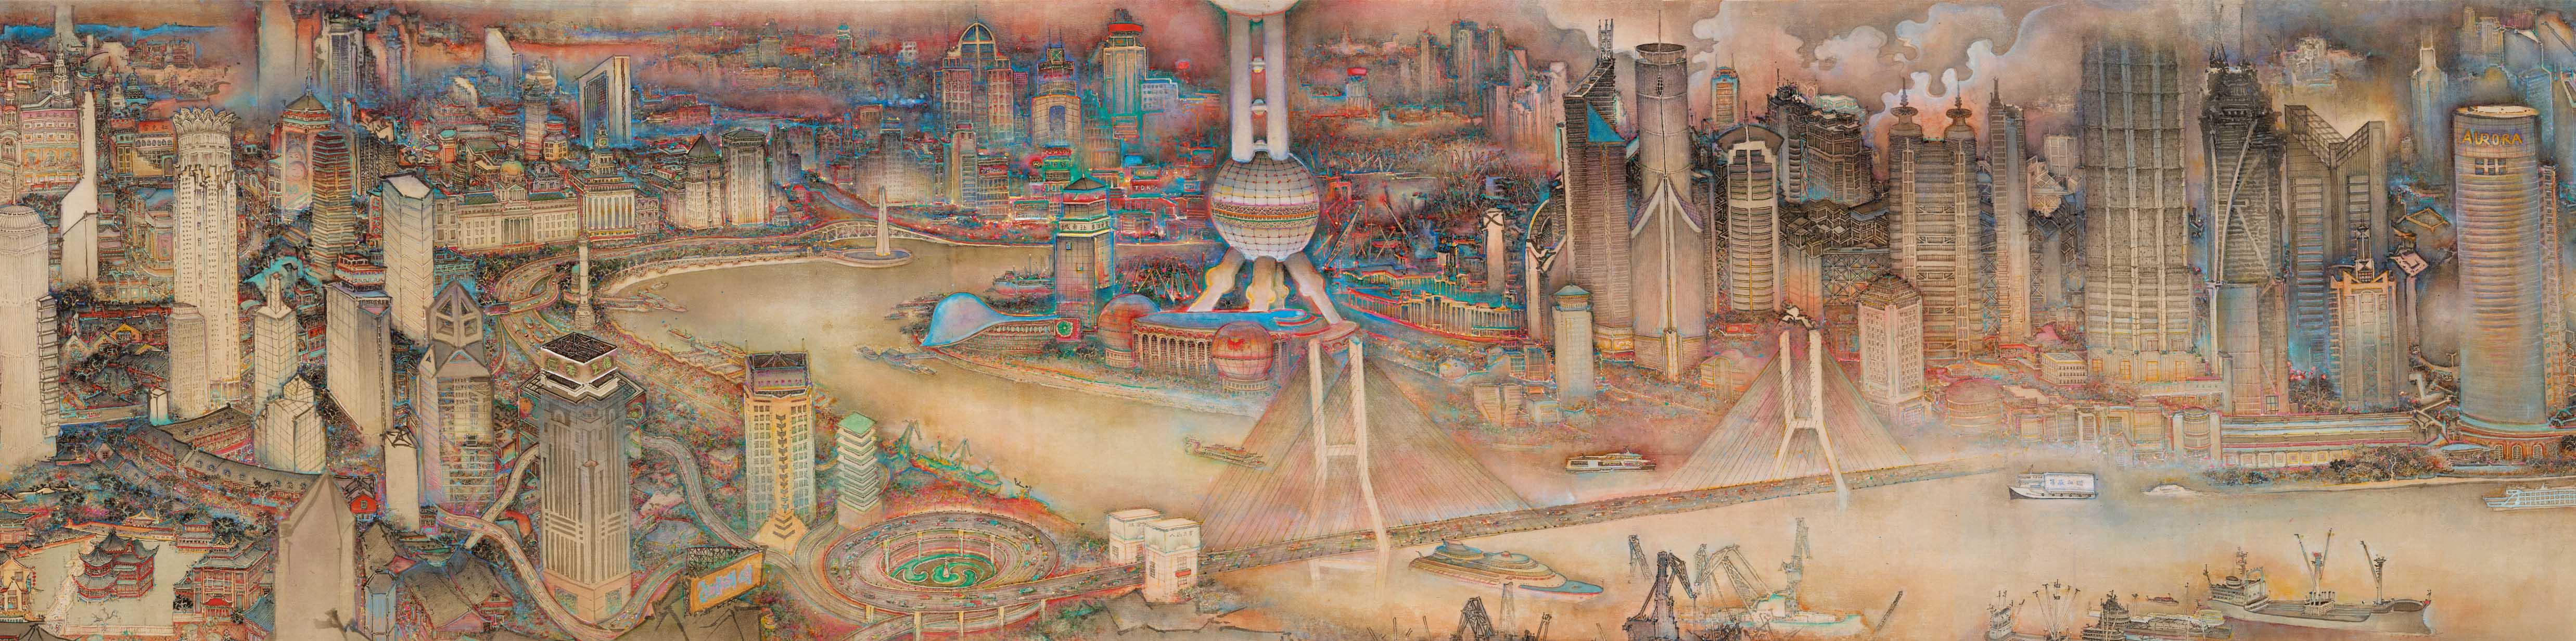 28.New Vista of Shanghai- Color ink-2